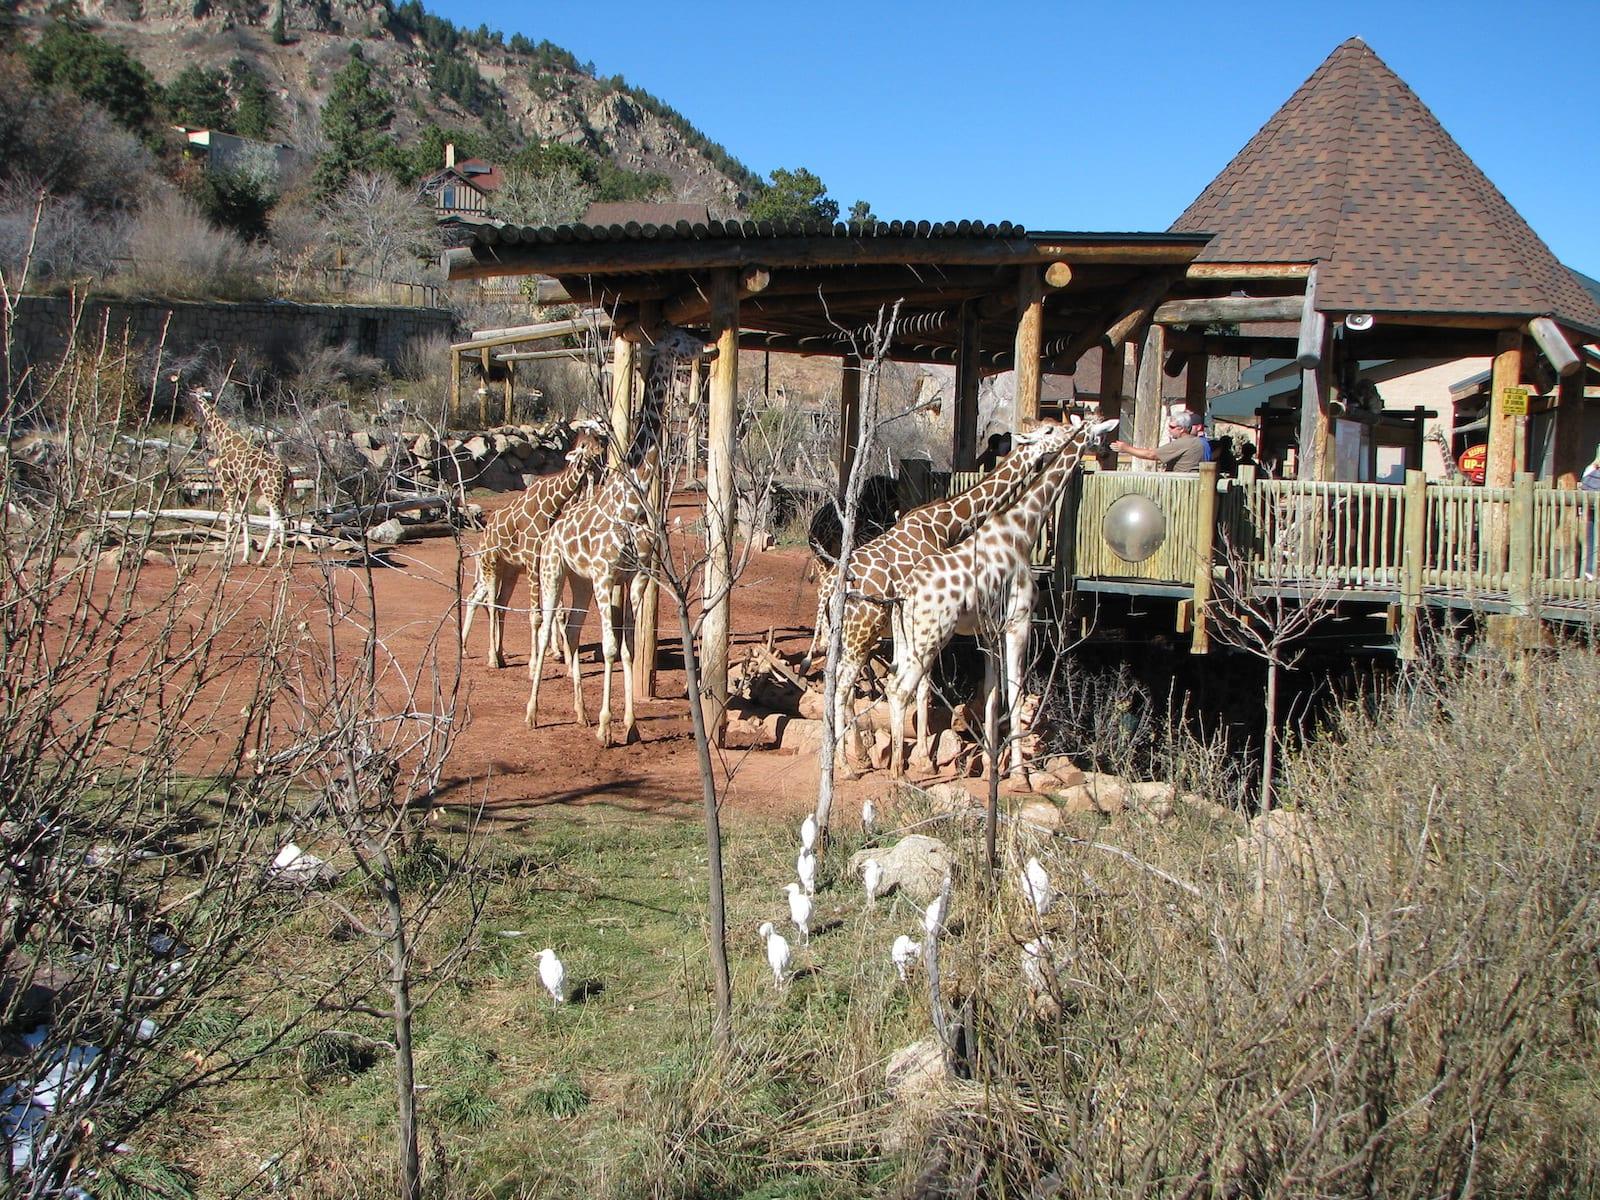 Cheyenne Mountain Zoo, Colorado